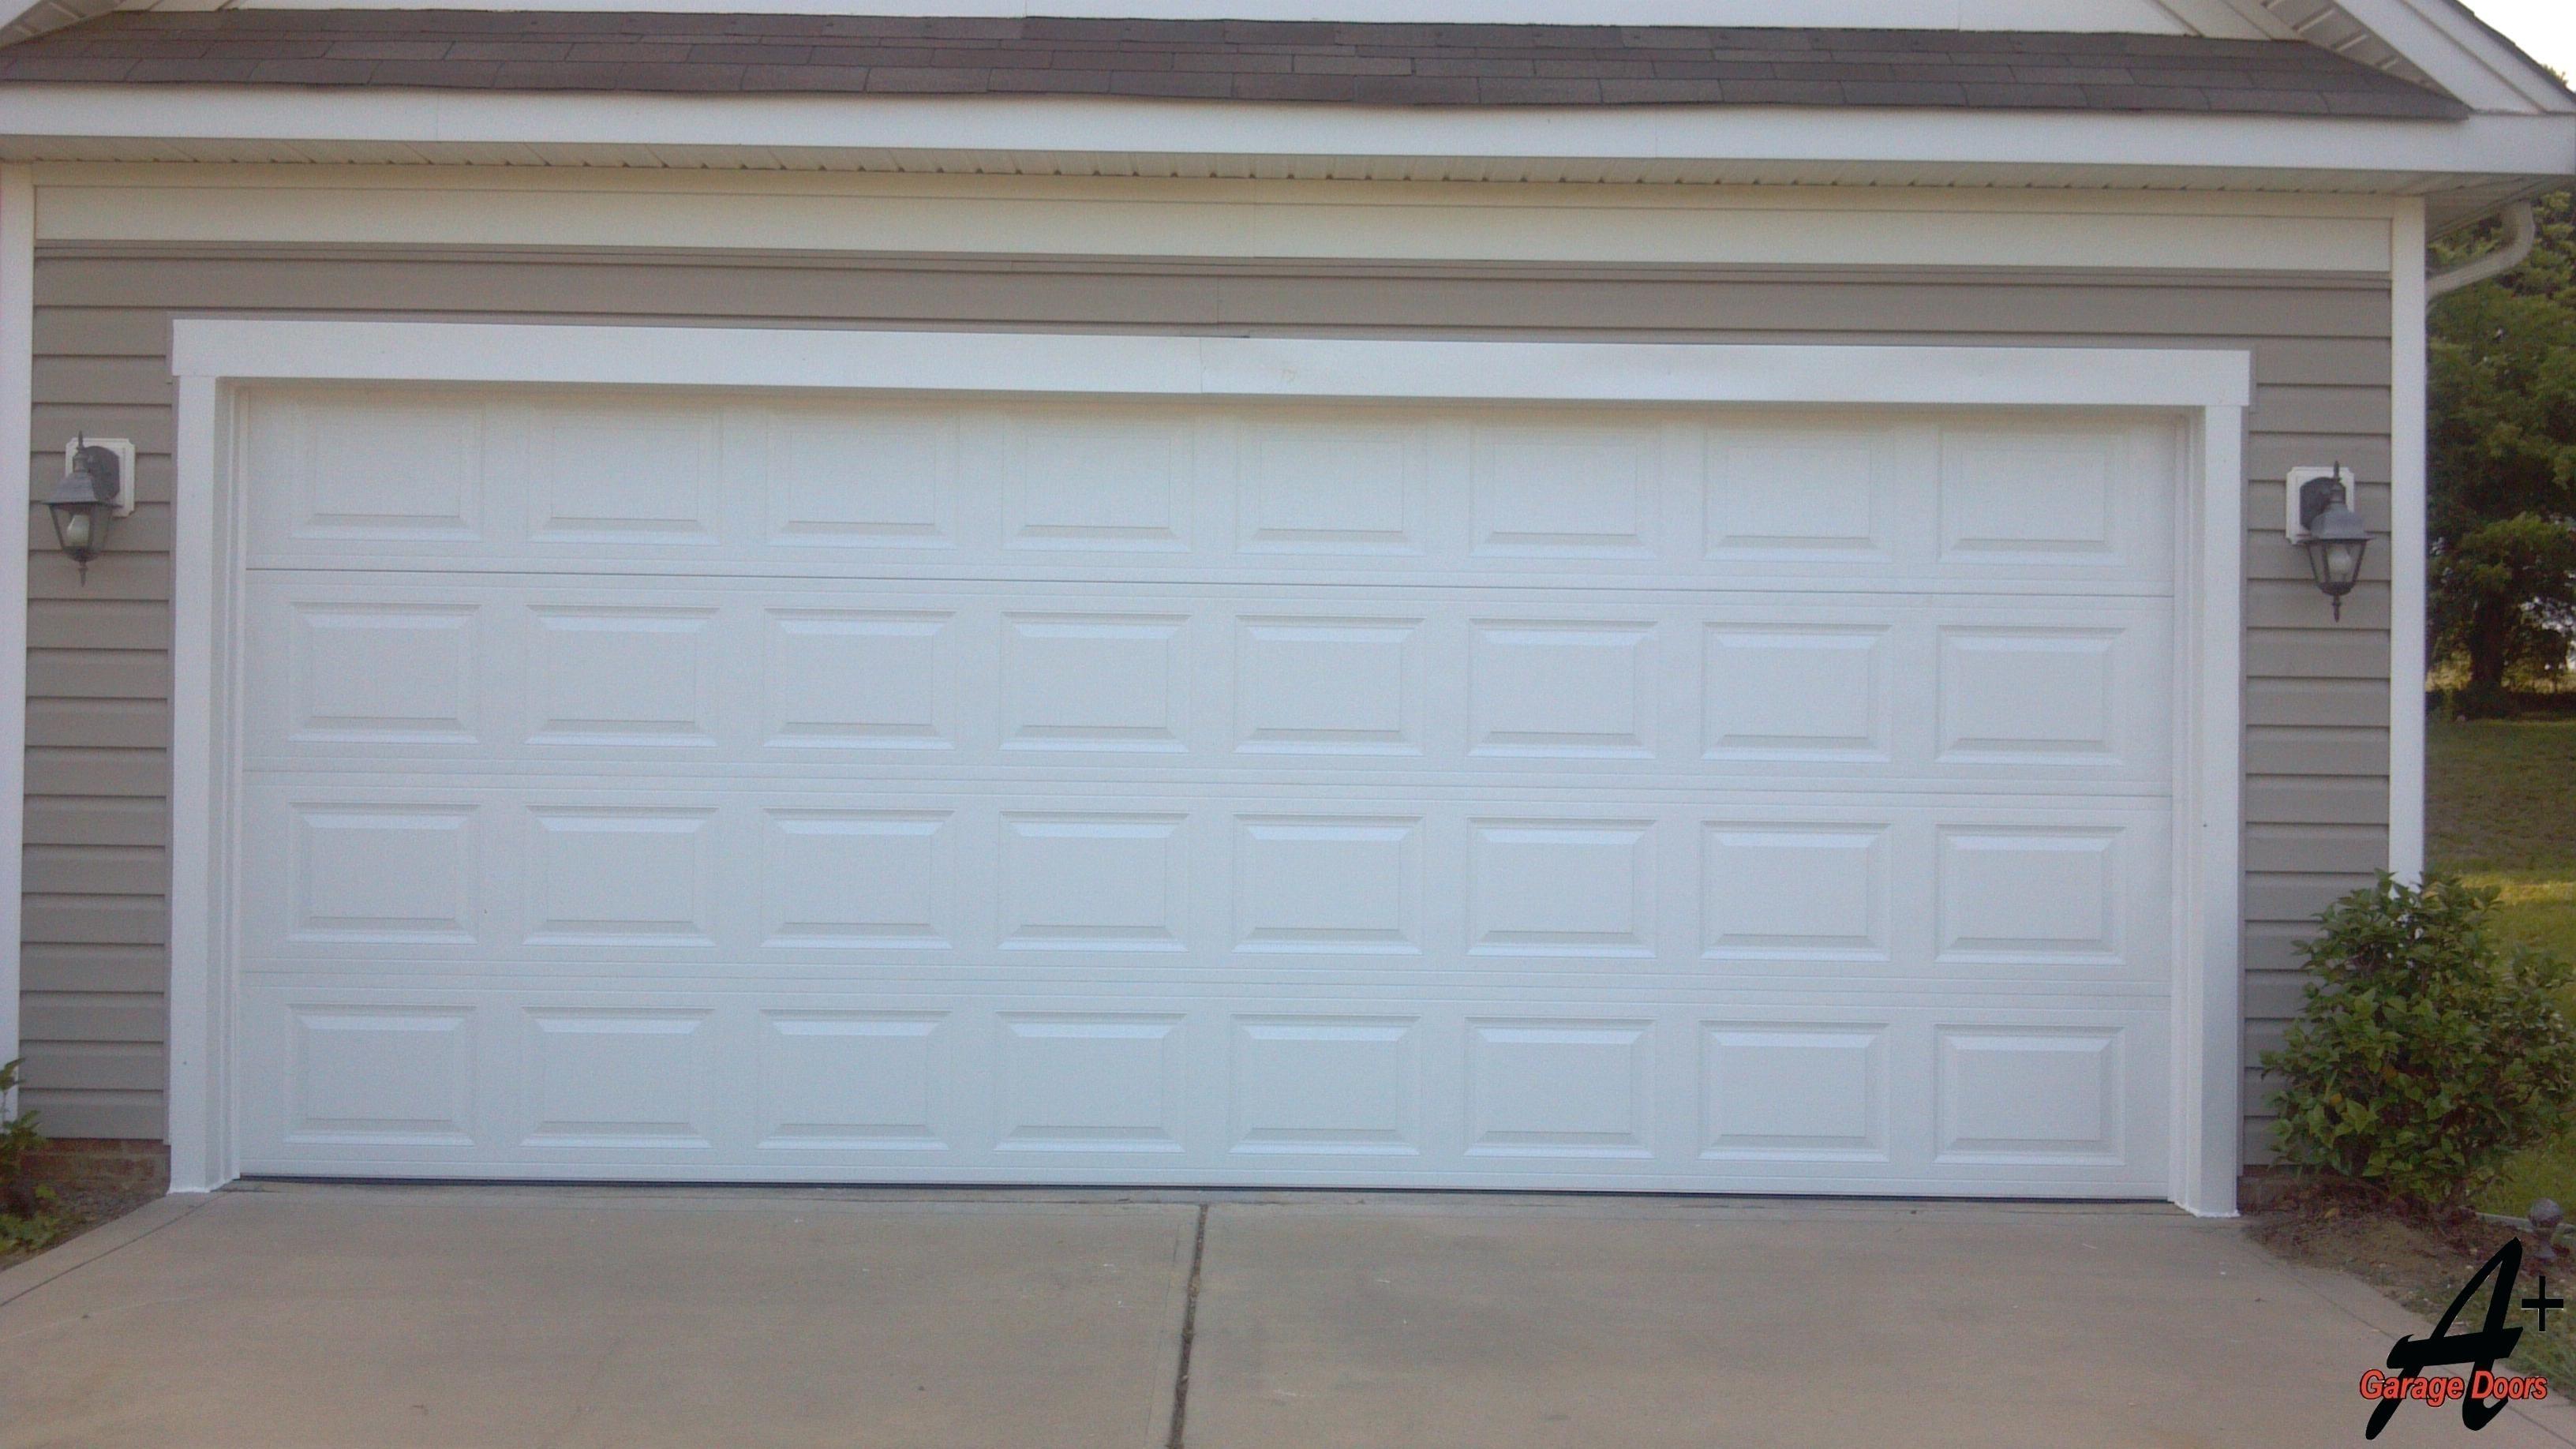 Python Garage Door Opener Ocg750 Pertaining To Wish Http